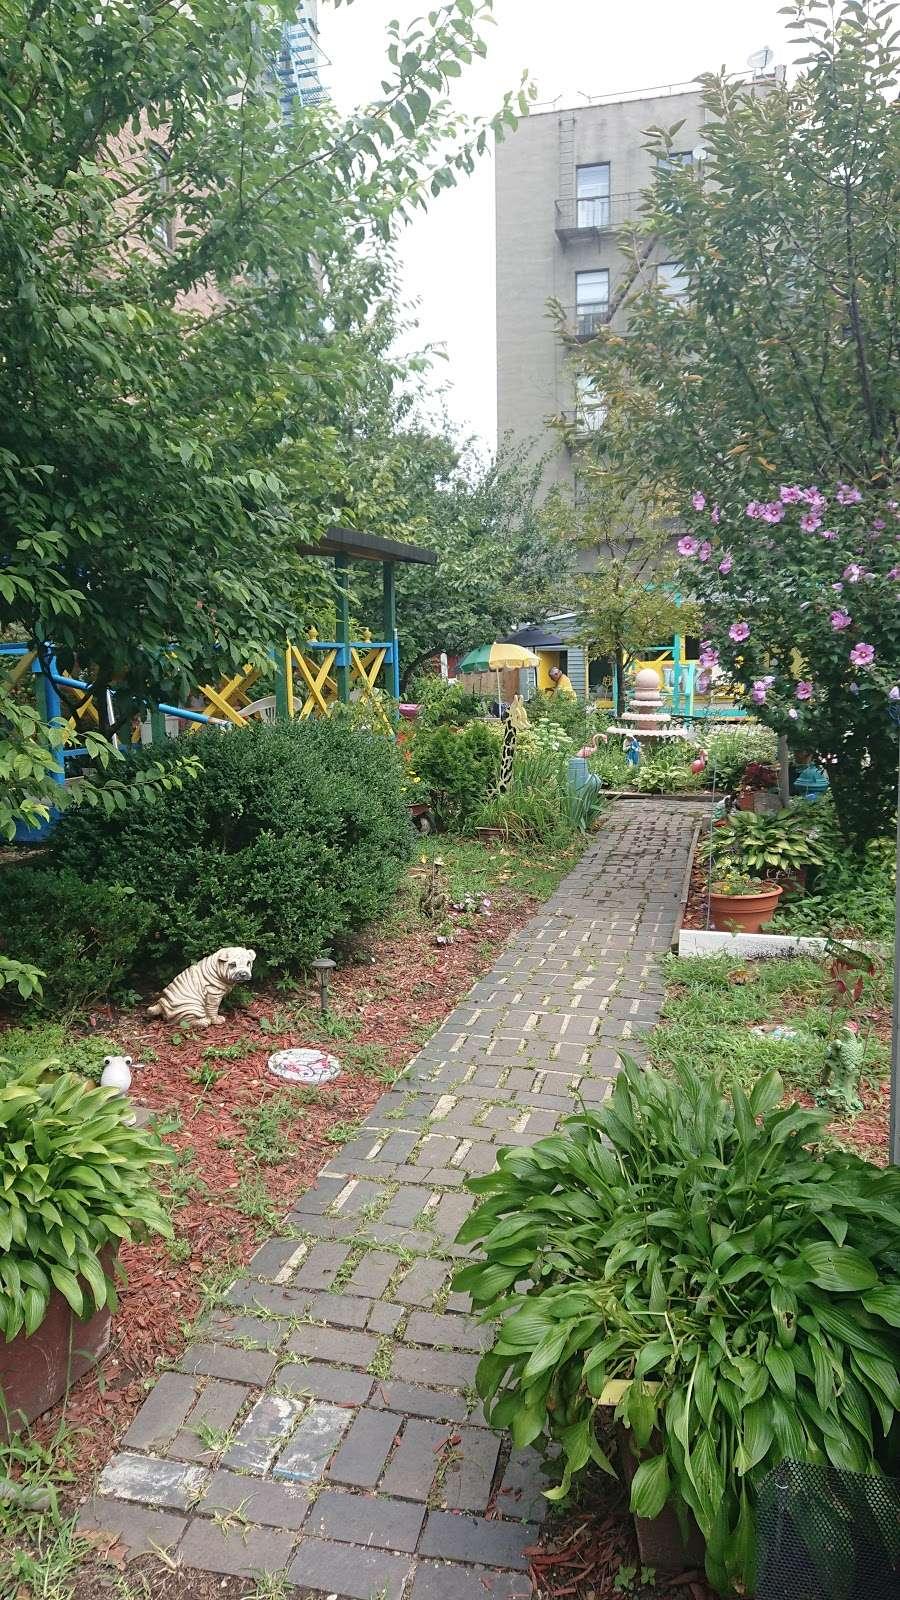 Hornaday Community Garden - park    Photo 6 of 10   Address: 851 Hornaday Pl, Bronx, NY 10460, USA   Phone: (347) 847-2525